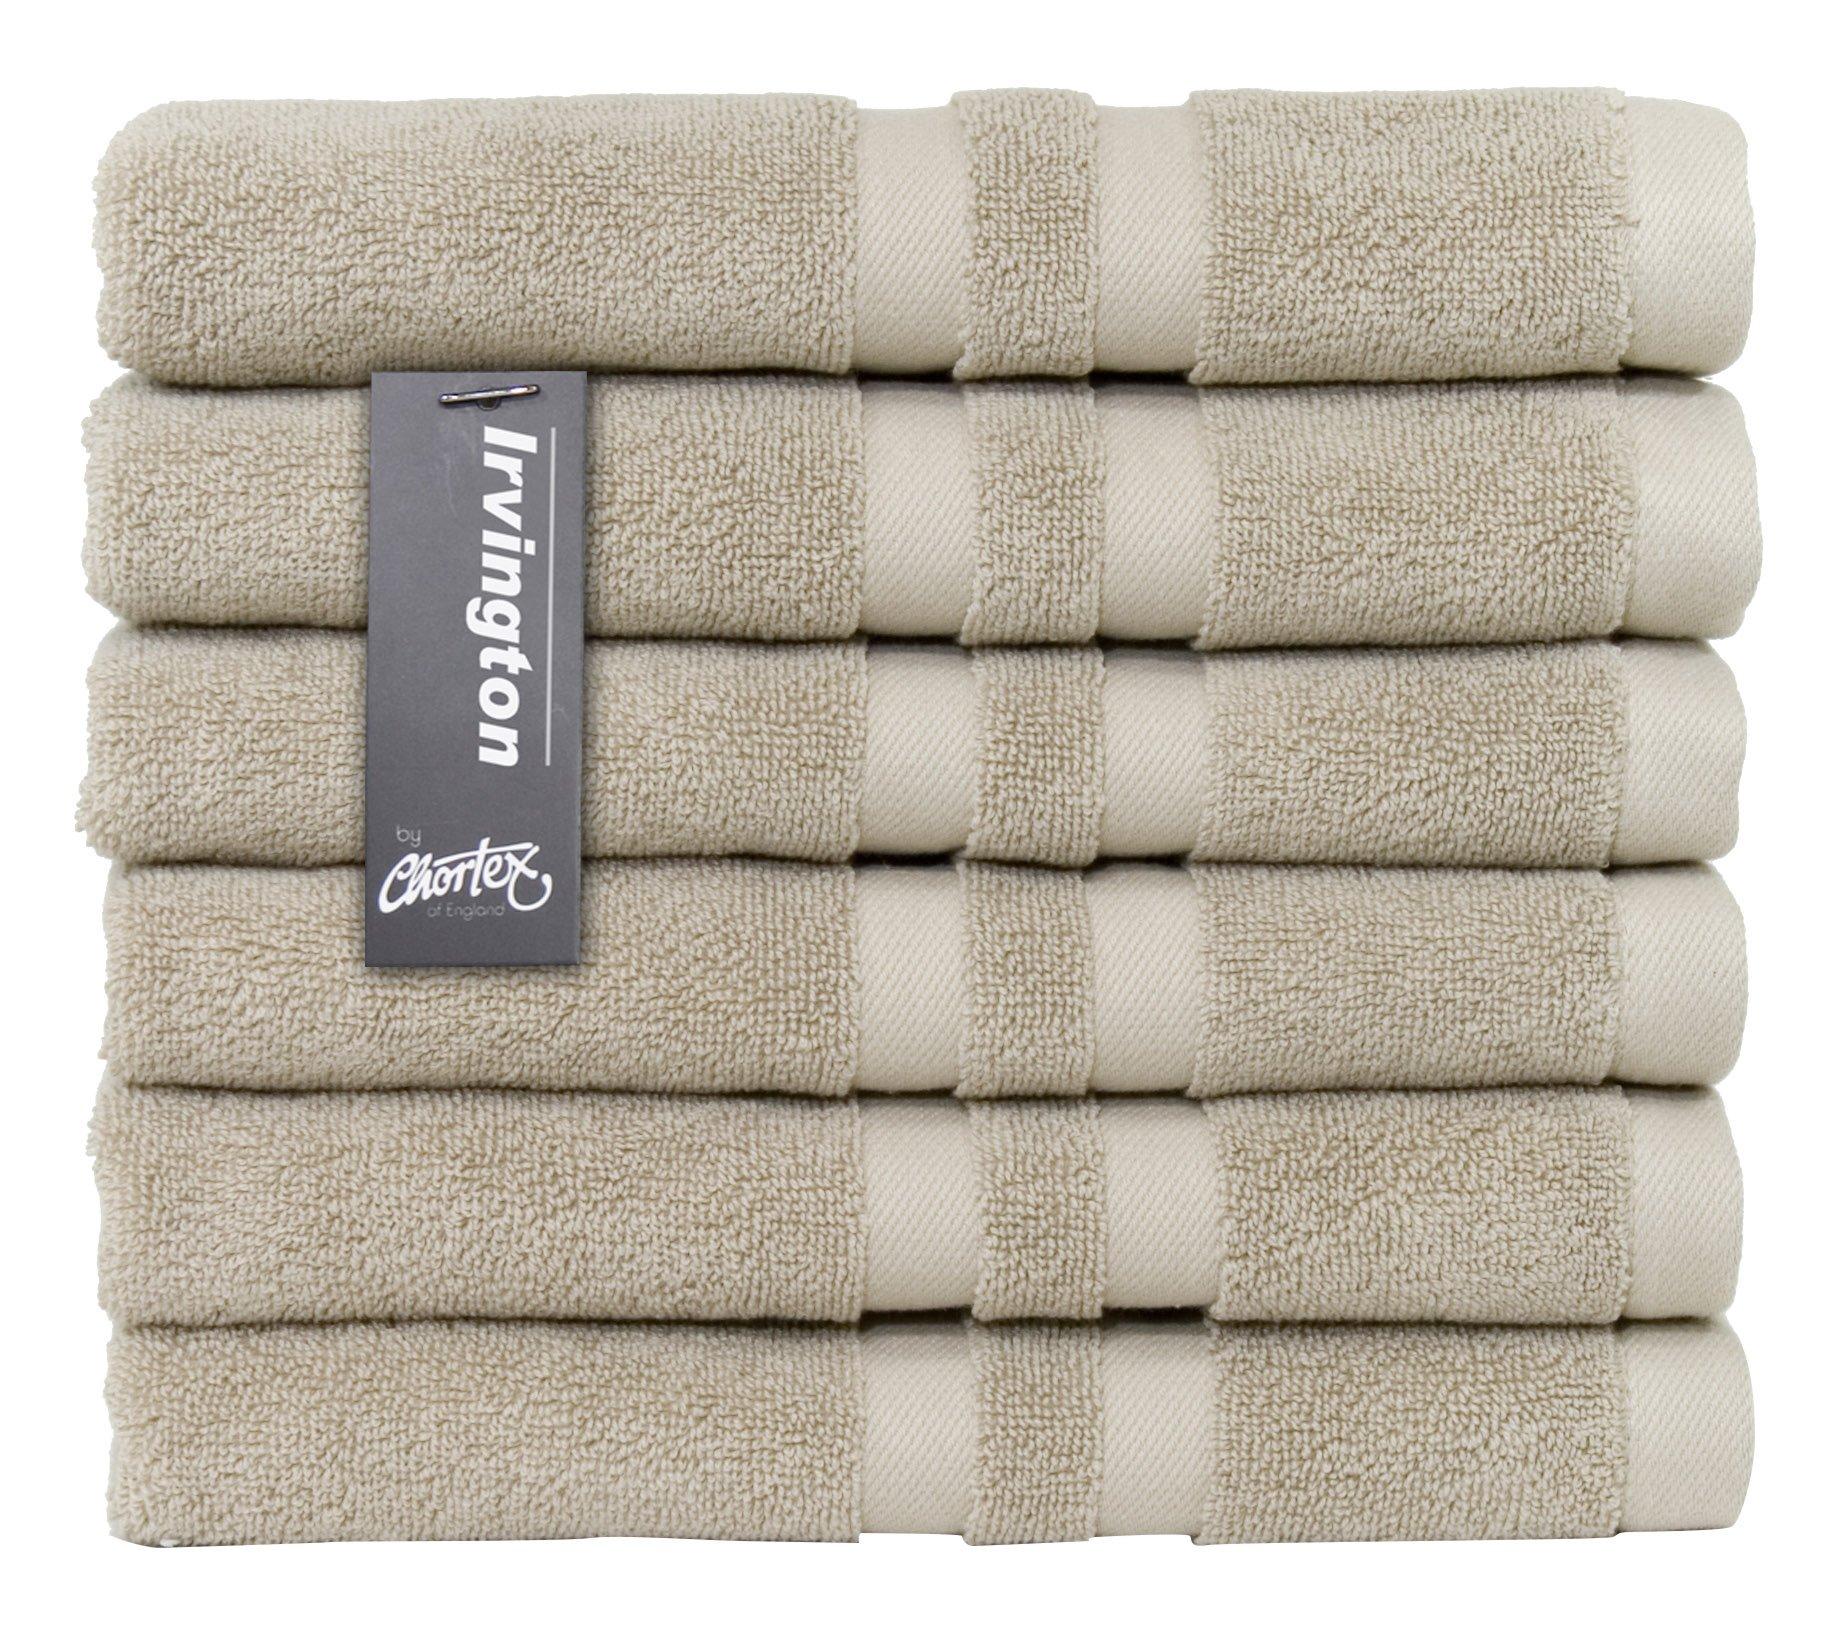 Chortex Luxury Turkish Cotton Hand Towel (6 Pack), Pack of 6, Flax